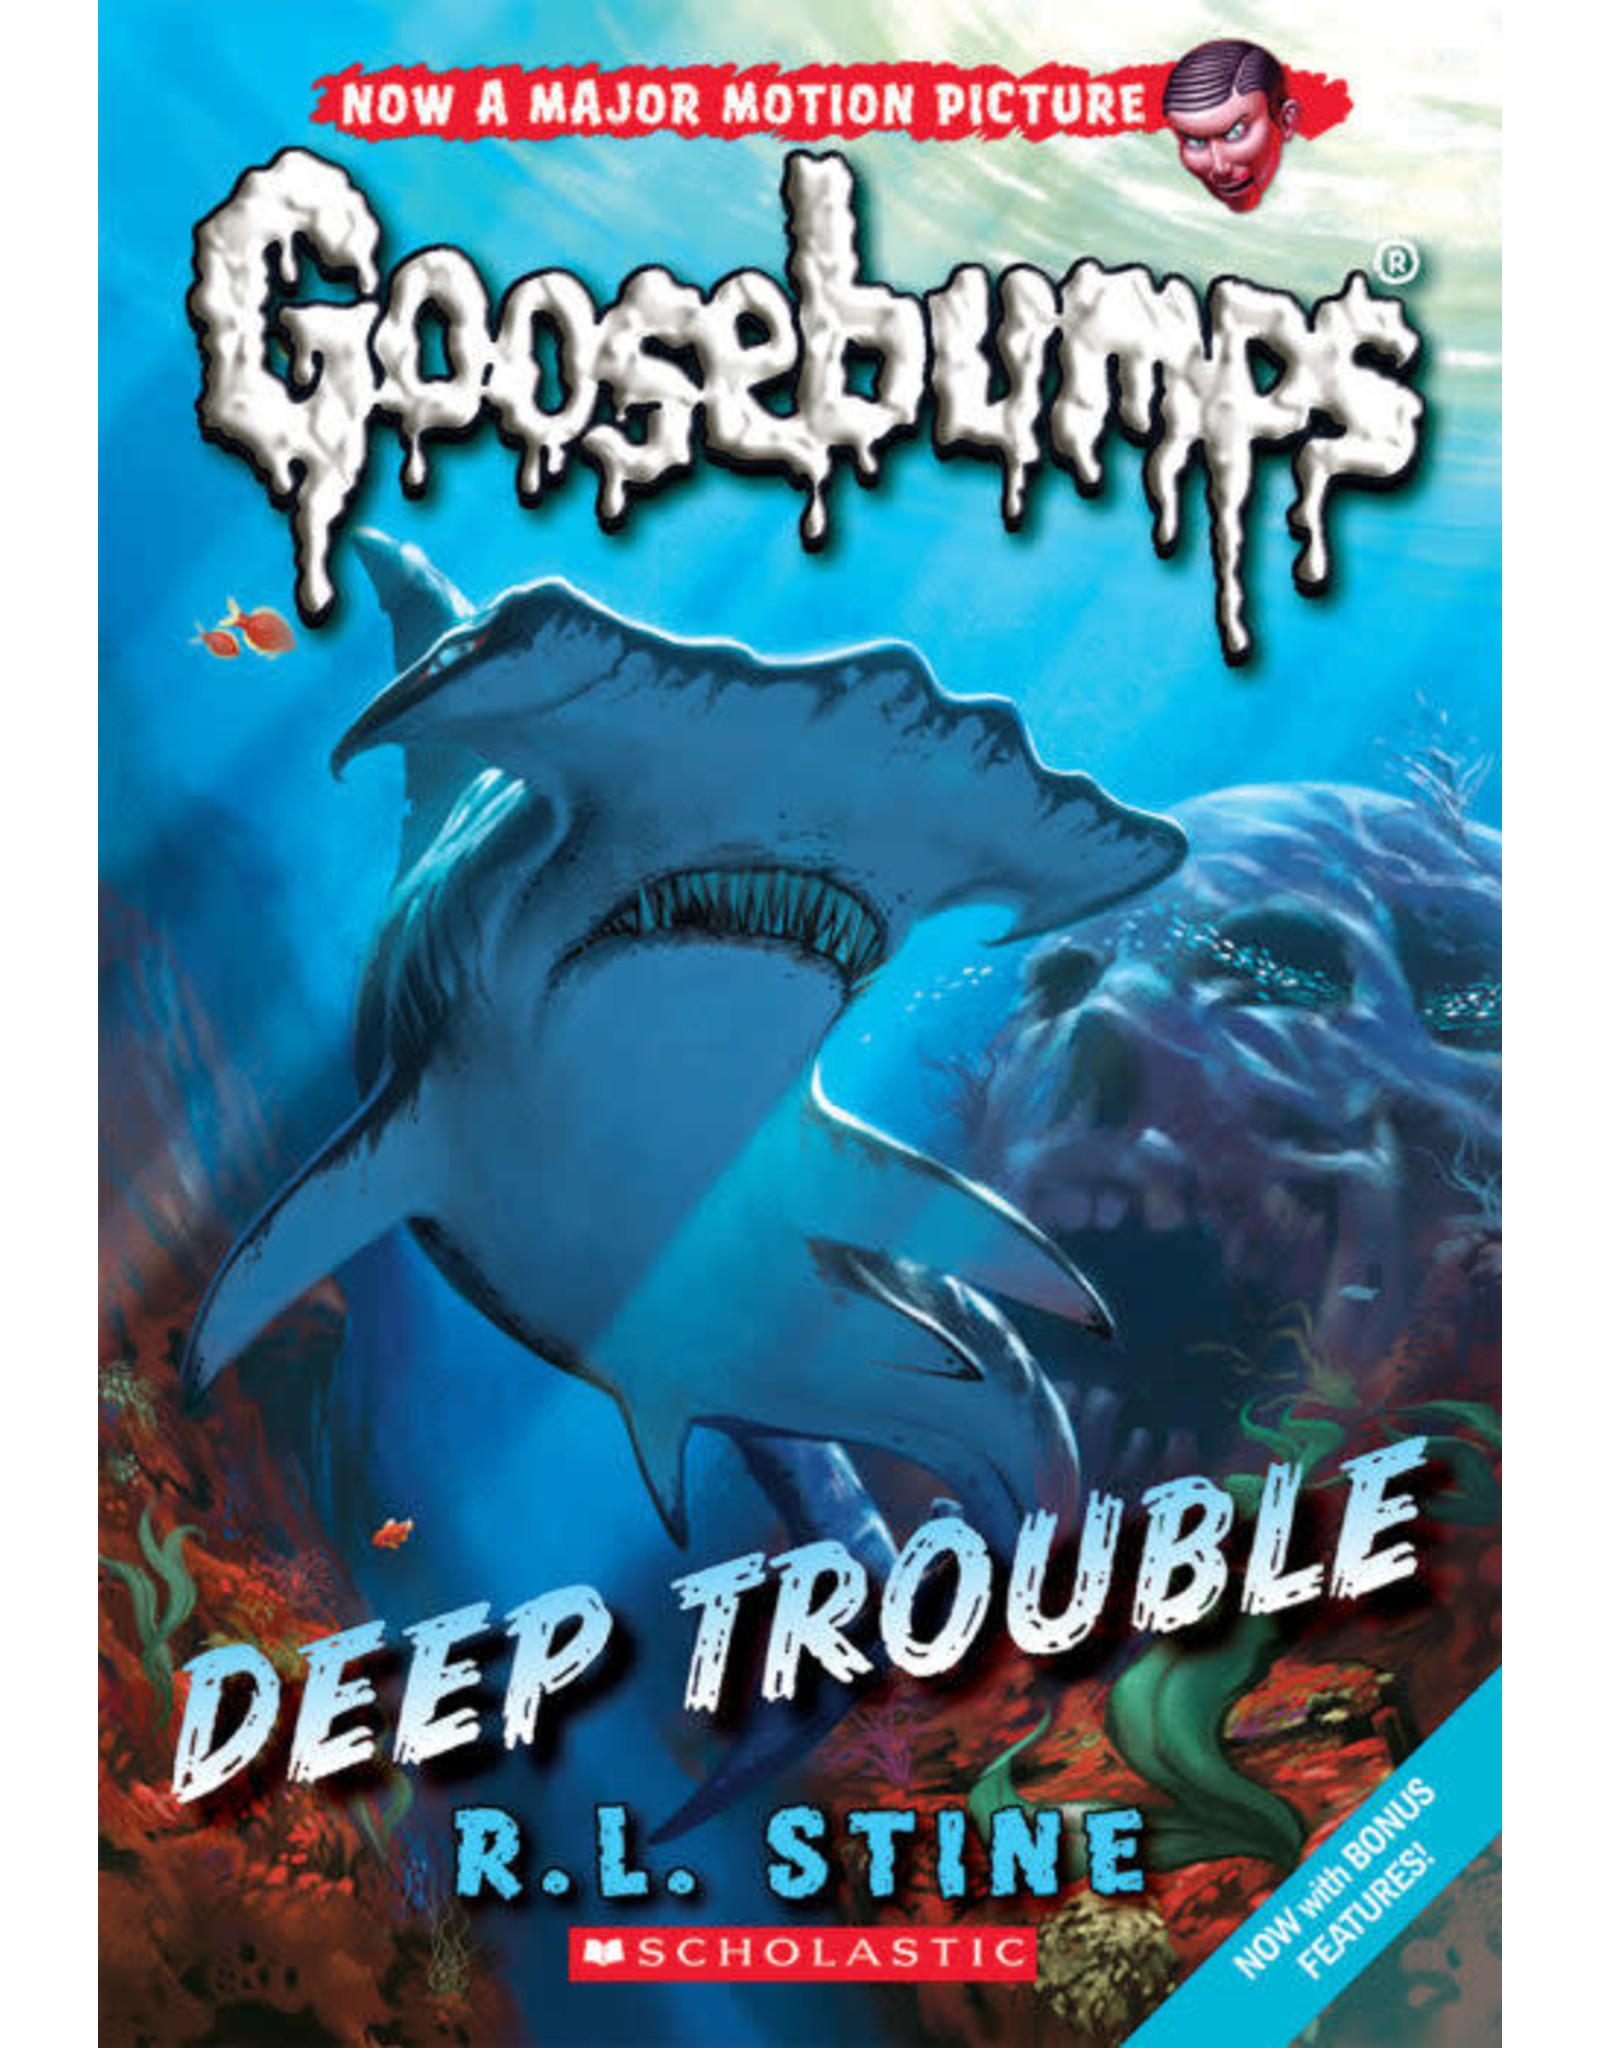 Scholastic Classic Goosebumps #02: Deep Trouble